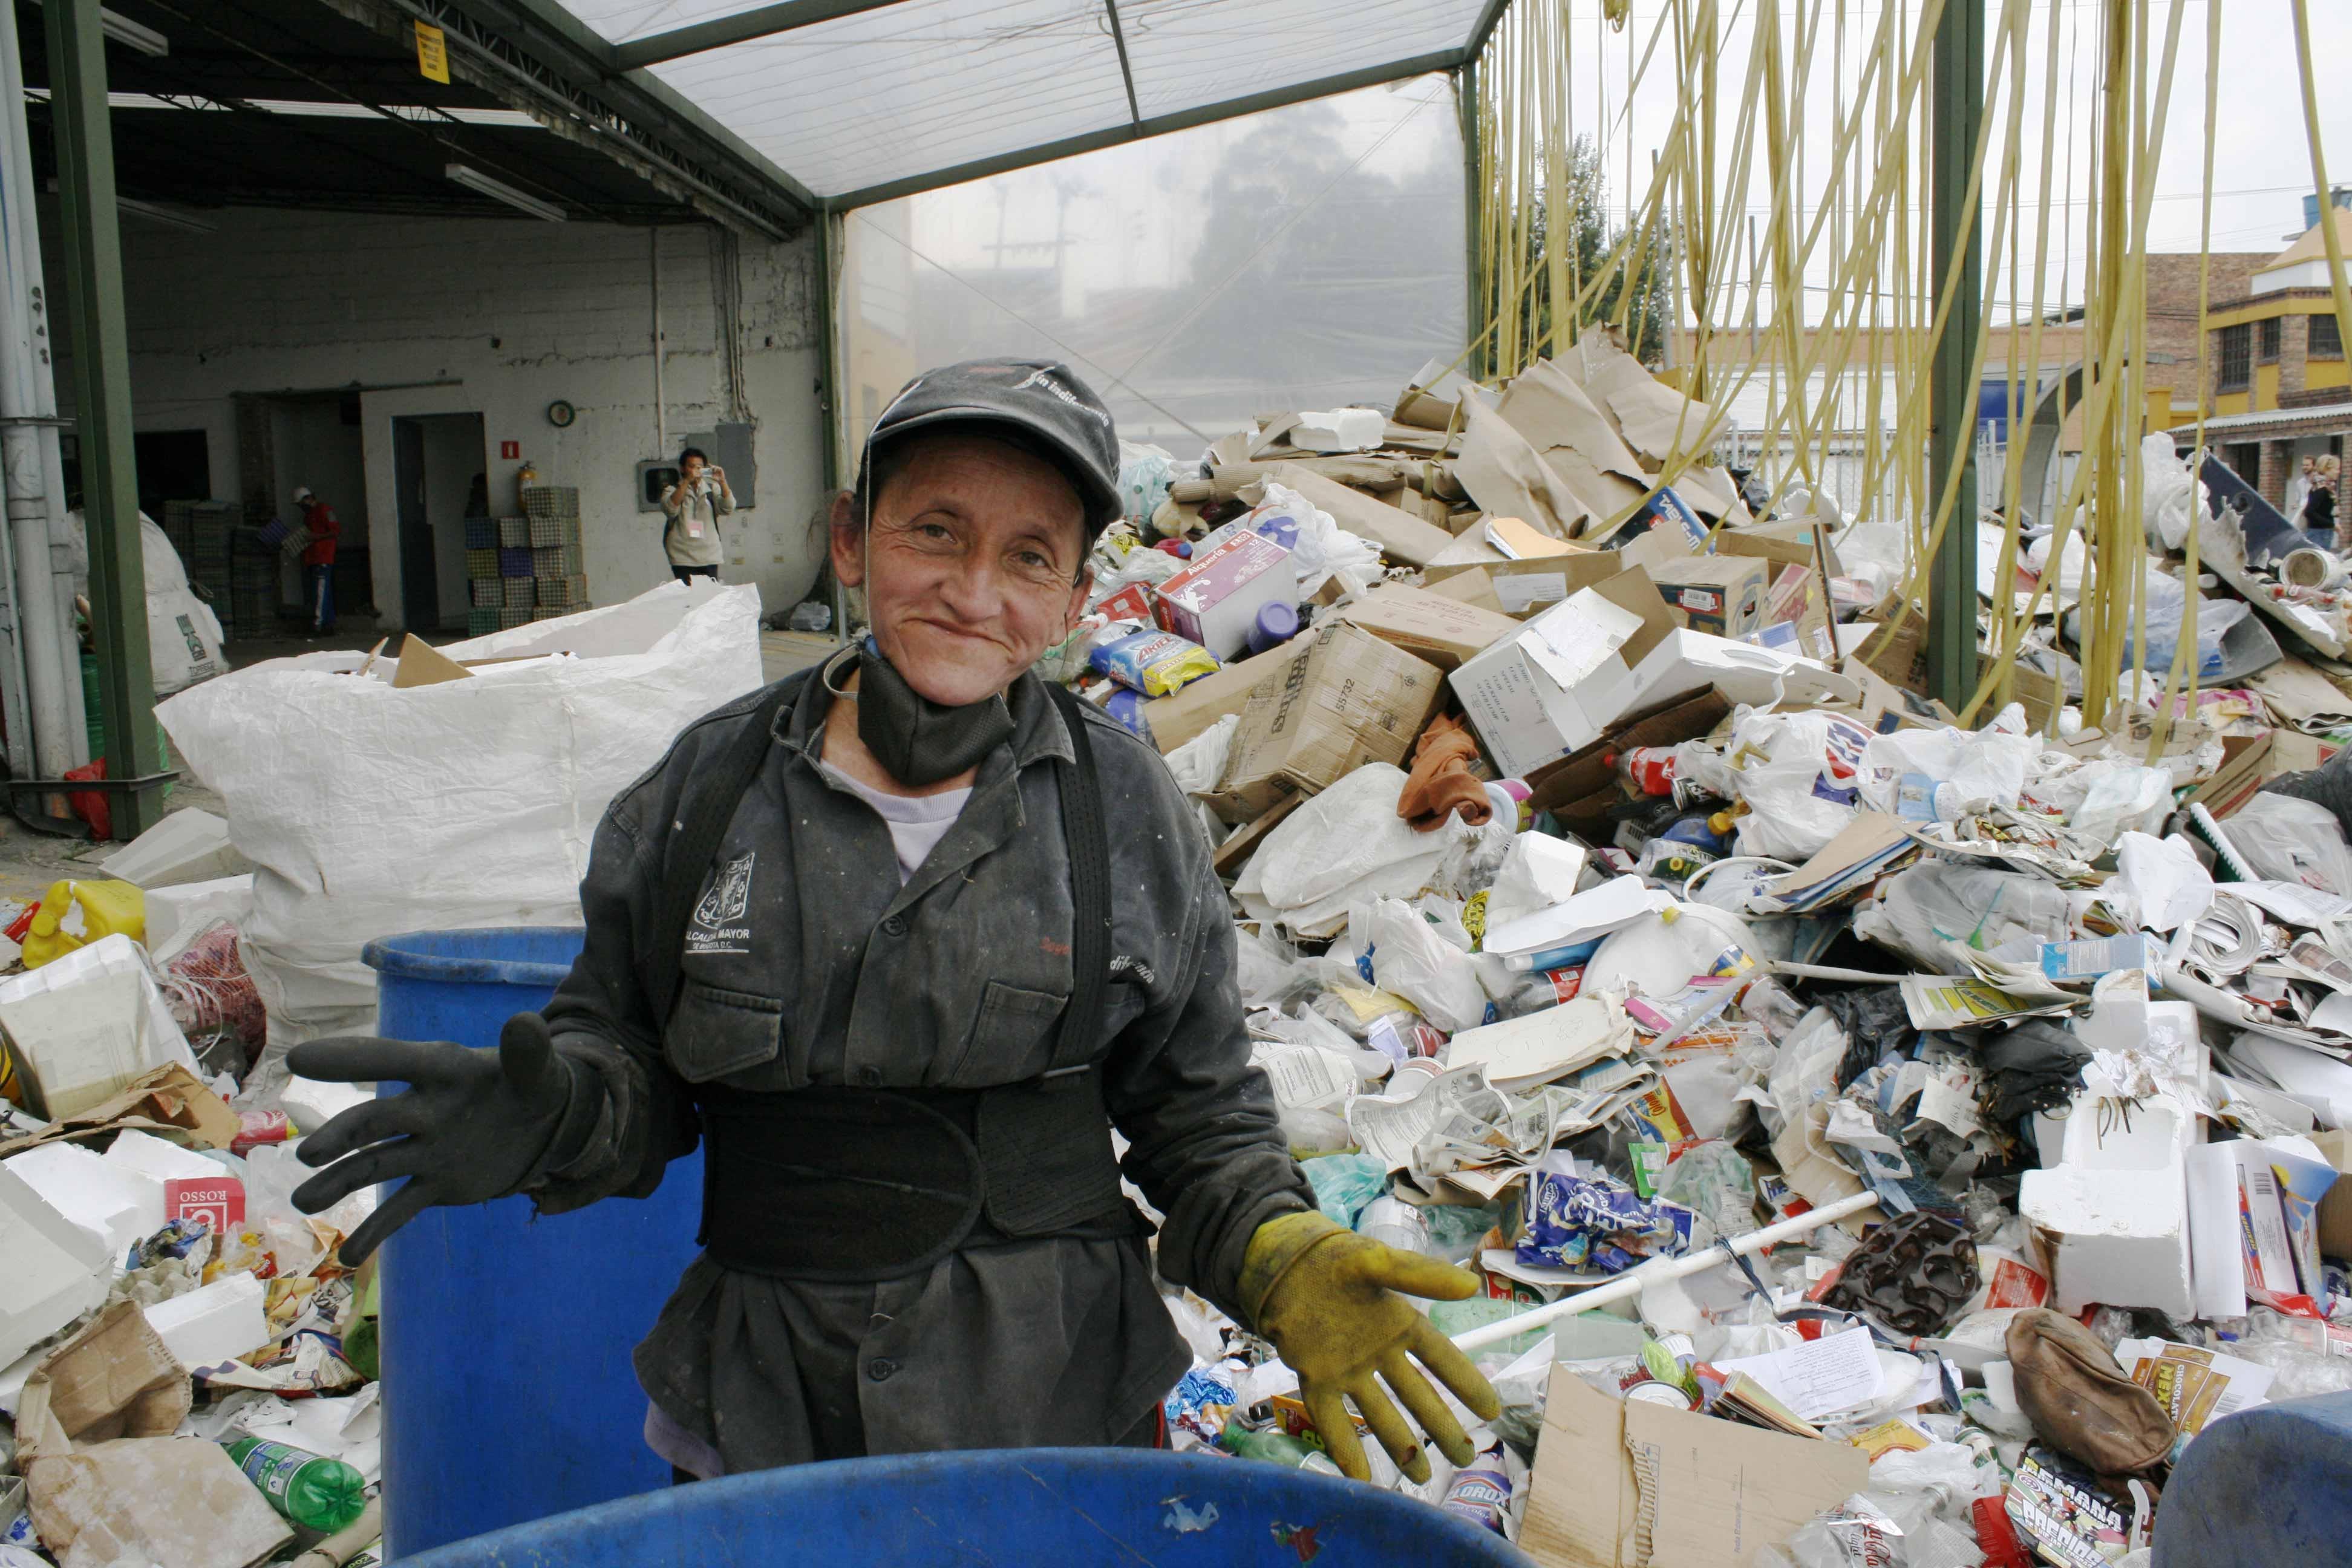 Arbeiterin in einem Recycling-Zentrum in Kolumbien